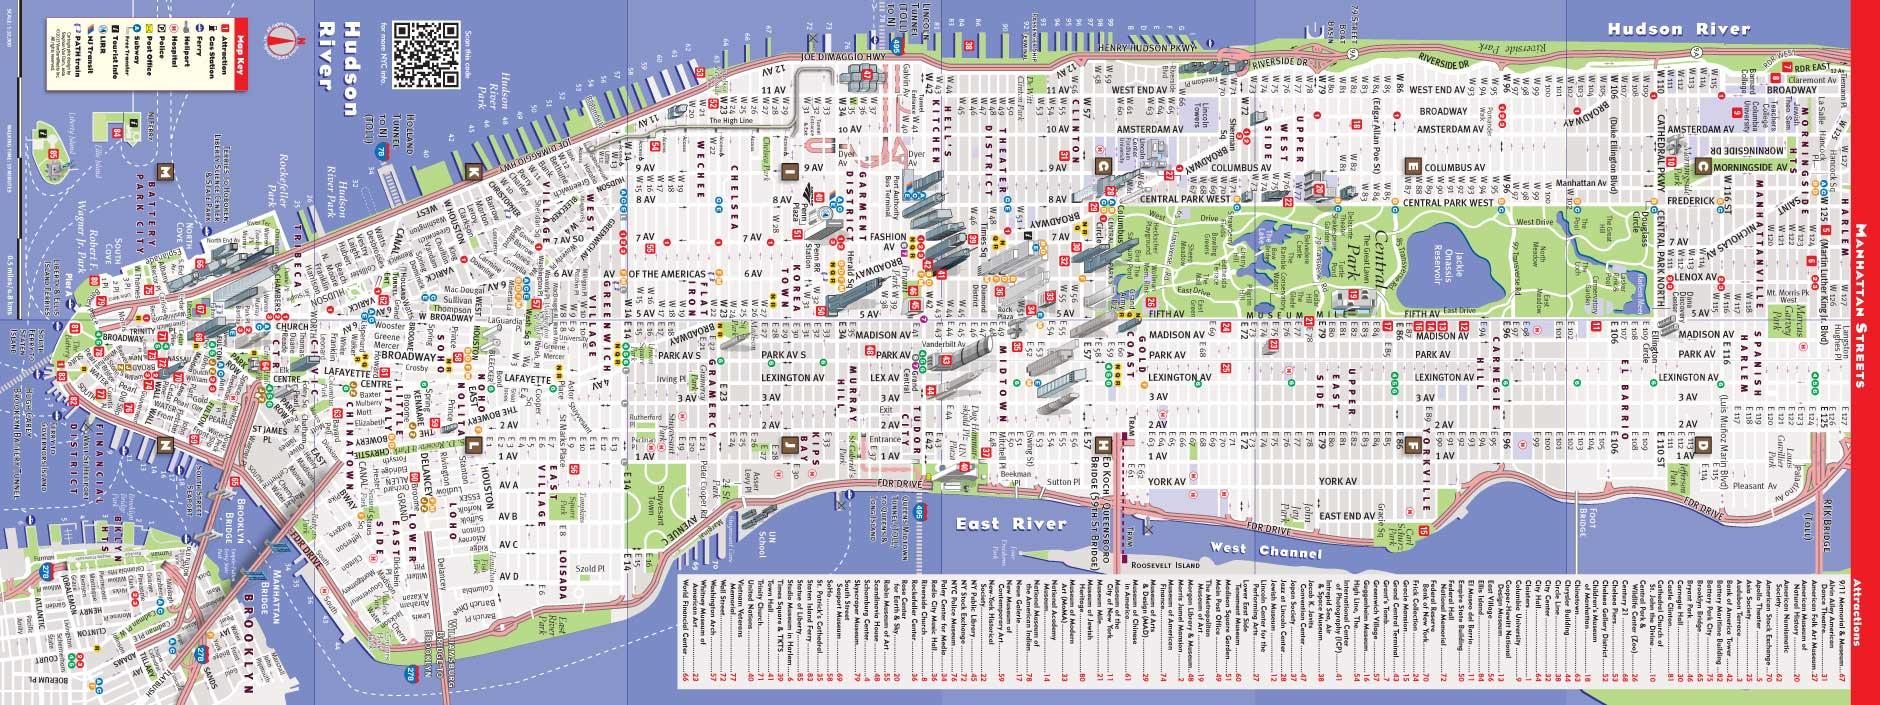 Printable New York Street Map | Travel Maps And Major Tourist - Printable Street Map Of Manhattan